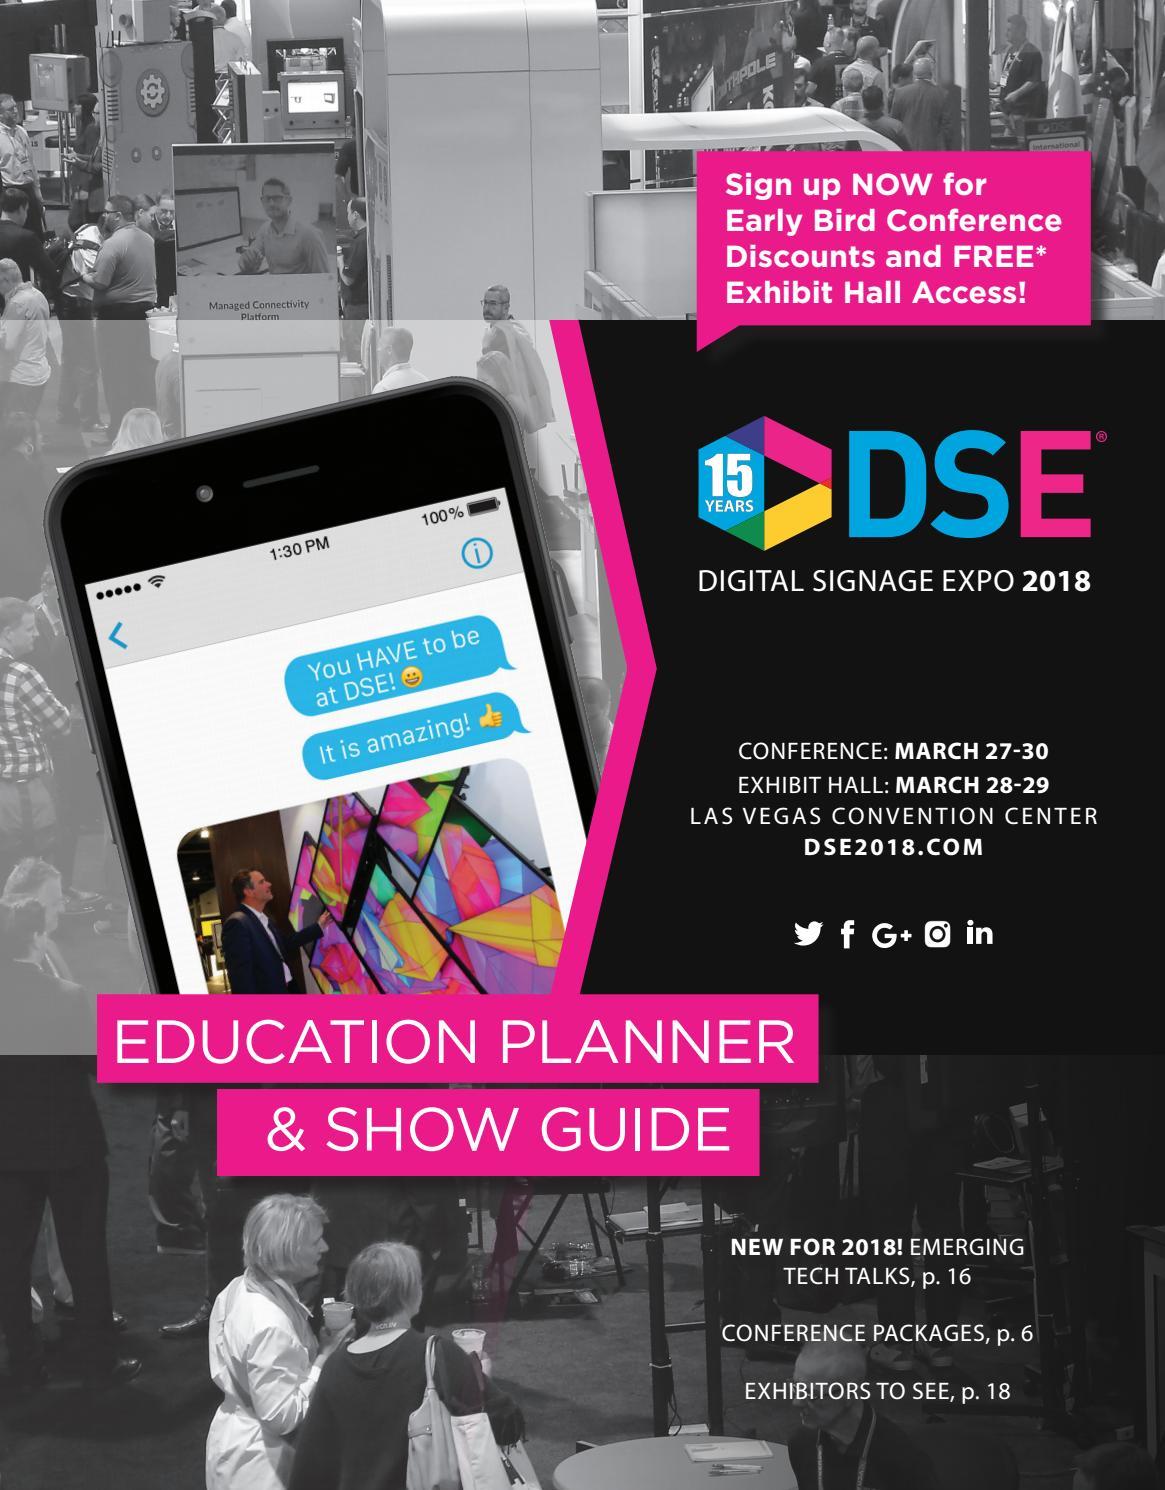 Digital Signage Expo 2018 Education Planner Show Guide By Nexcom Mars Exponation Llc Issuu